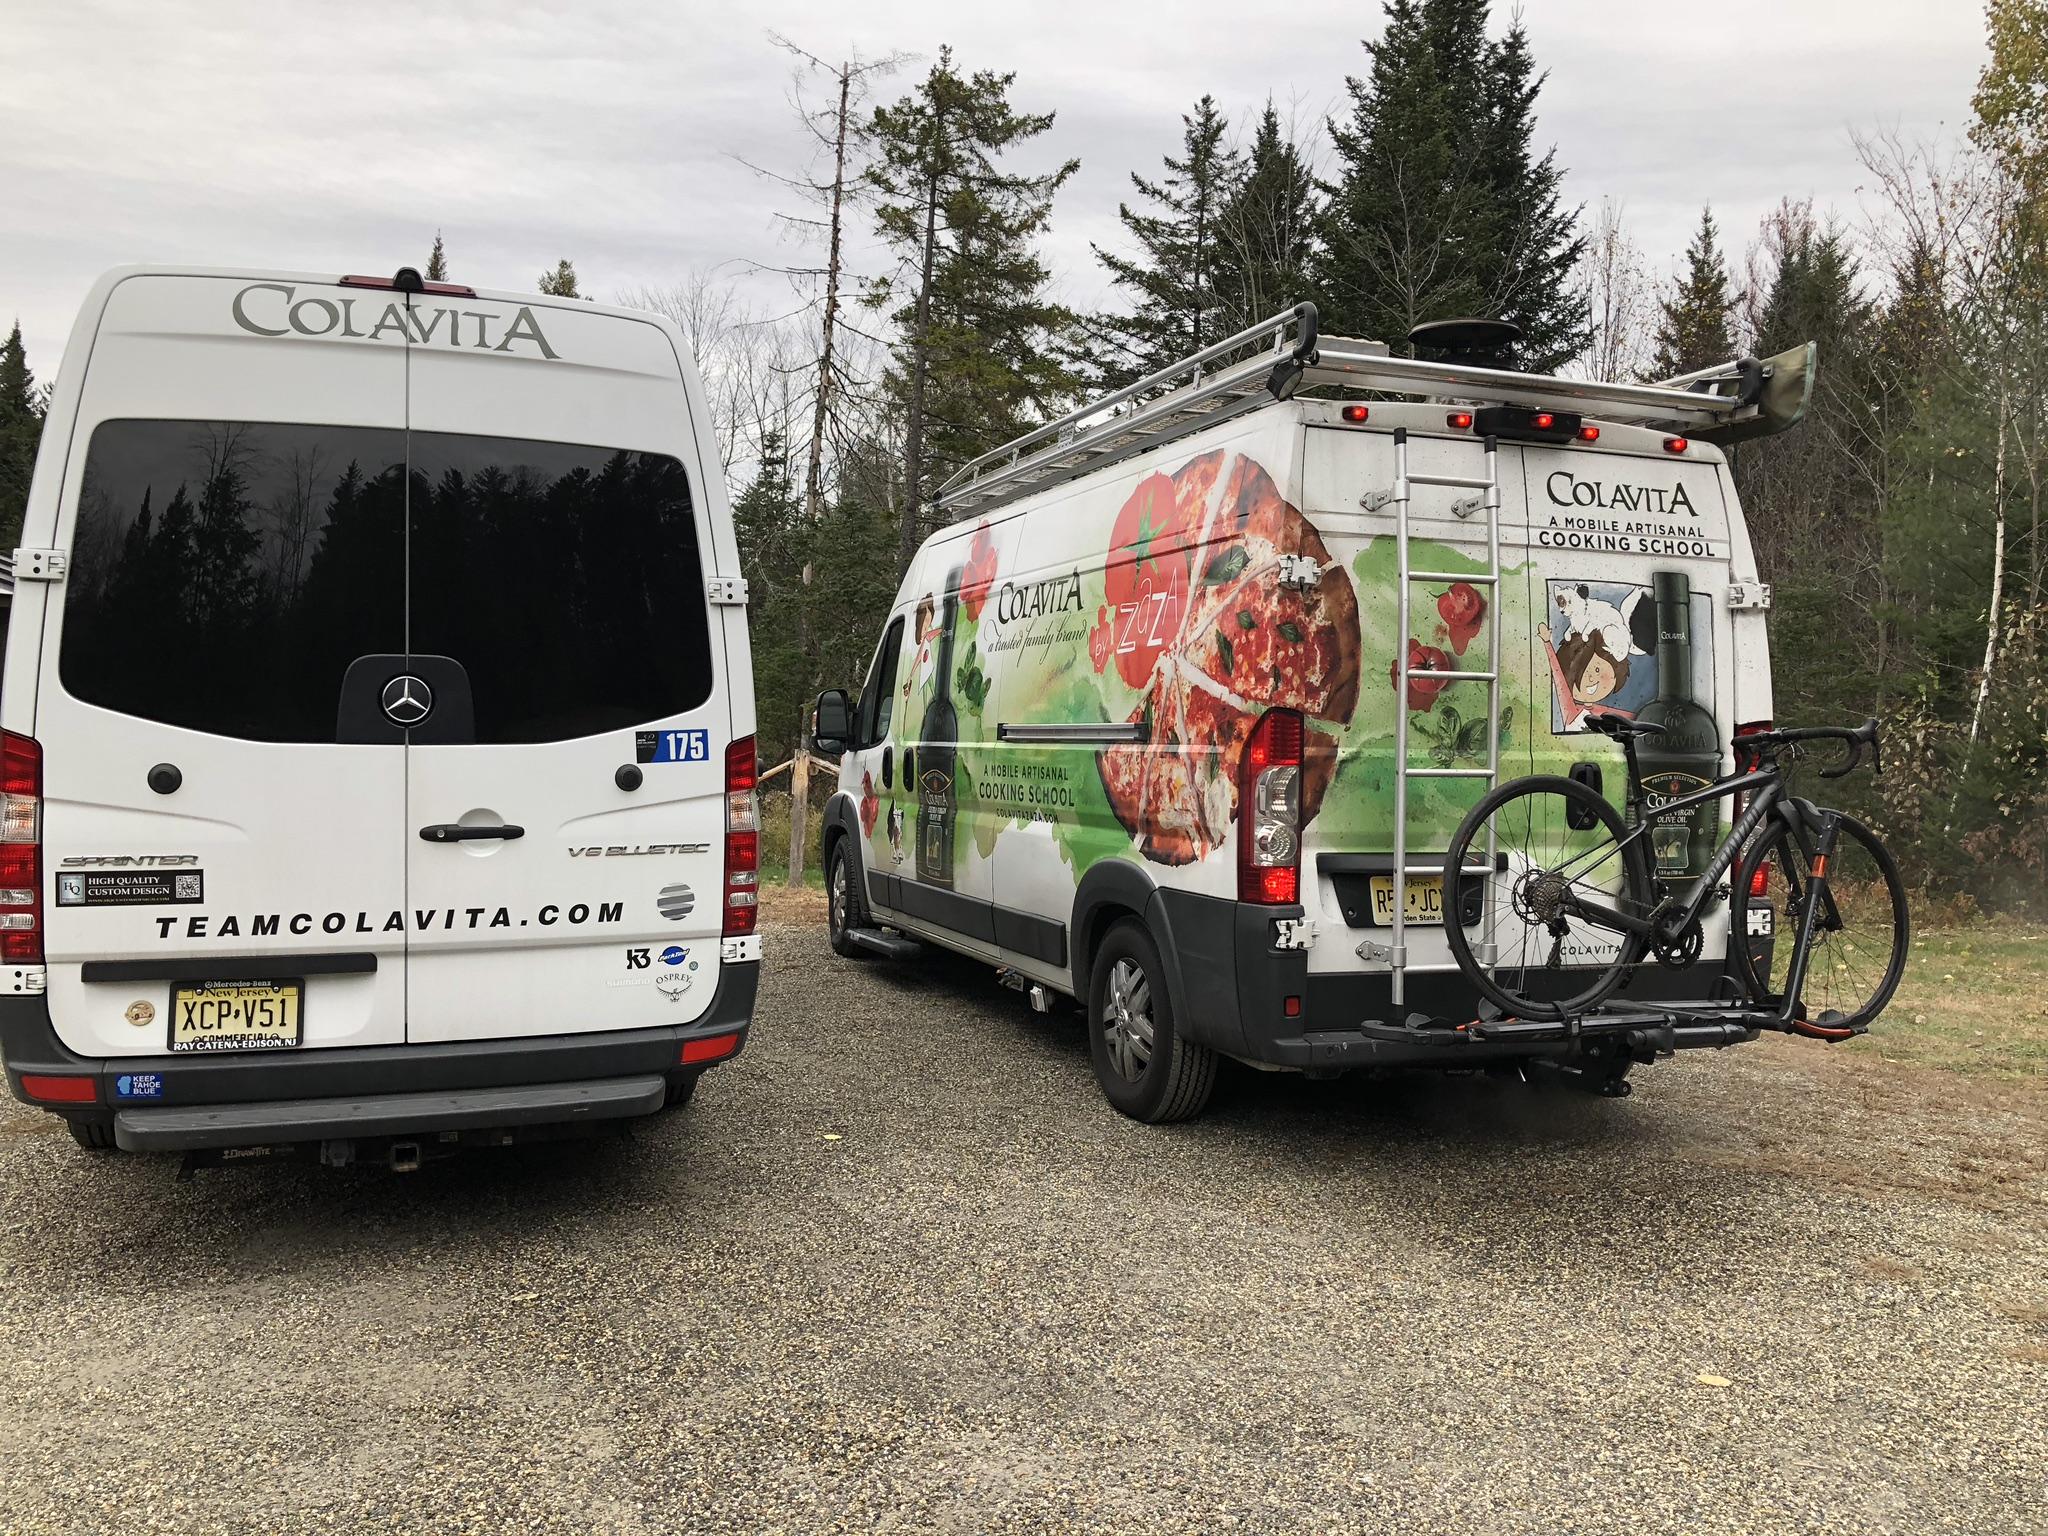 pizza van on the right, mobile repair van on the left. photo credit: colavita